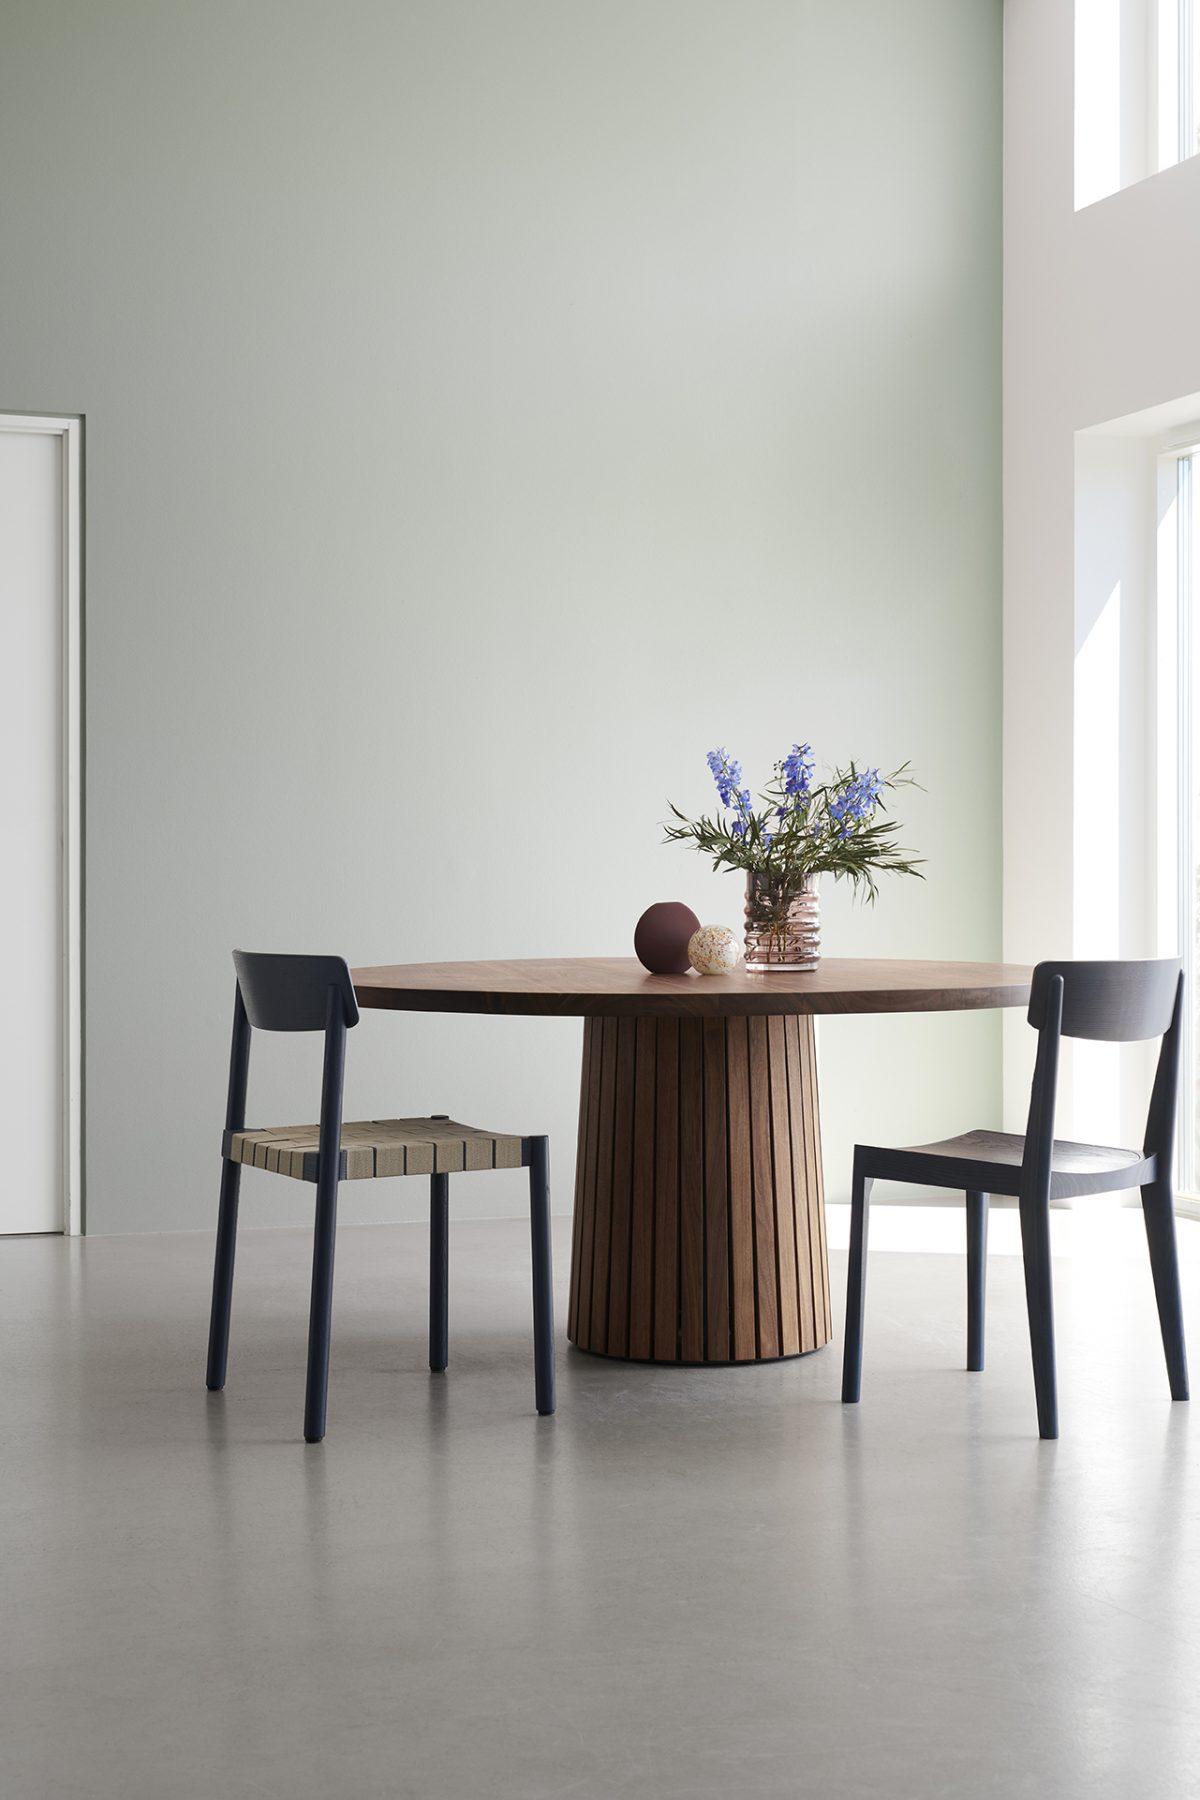 ASROSENVINGE_Traefolk_Formland_Table.jpg